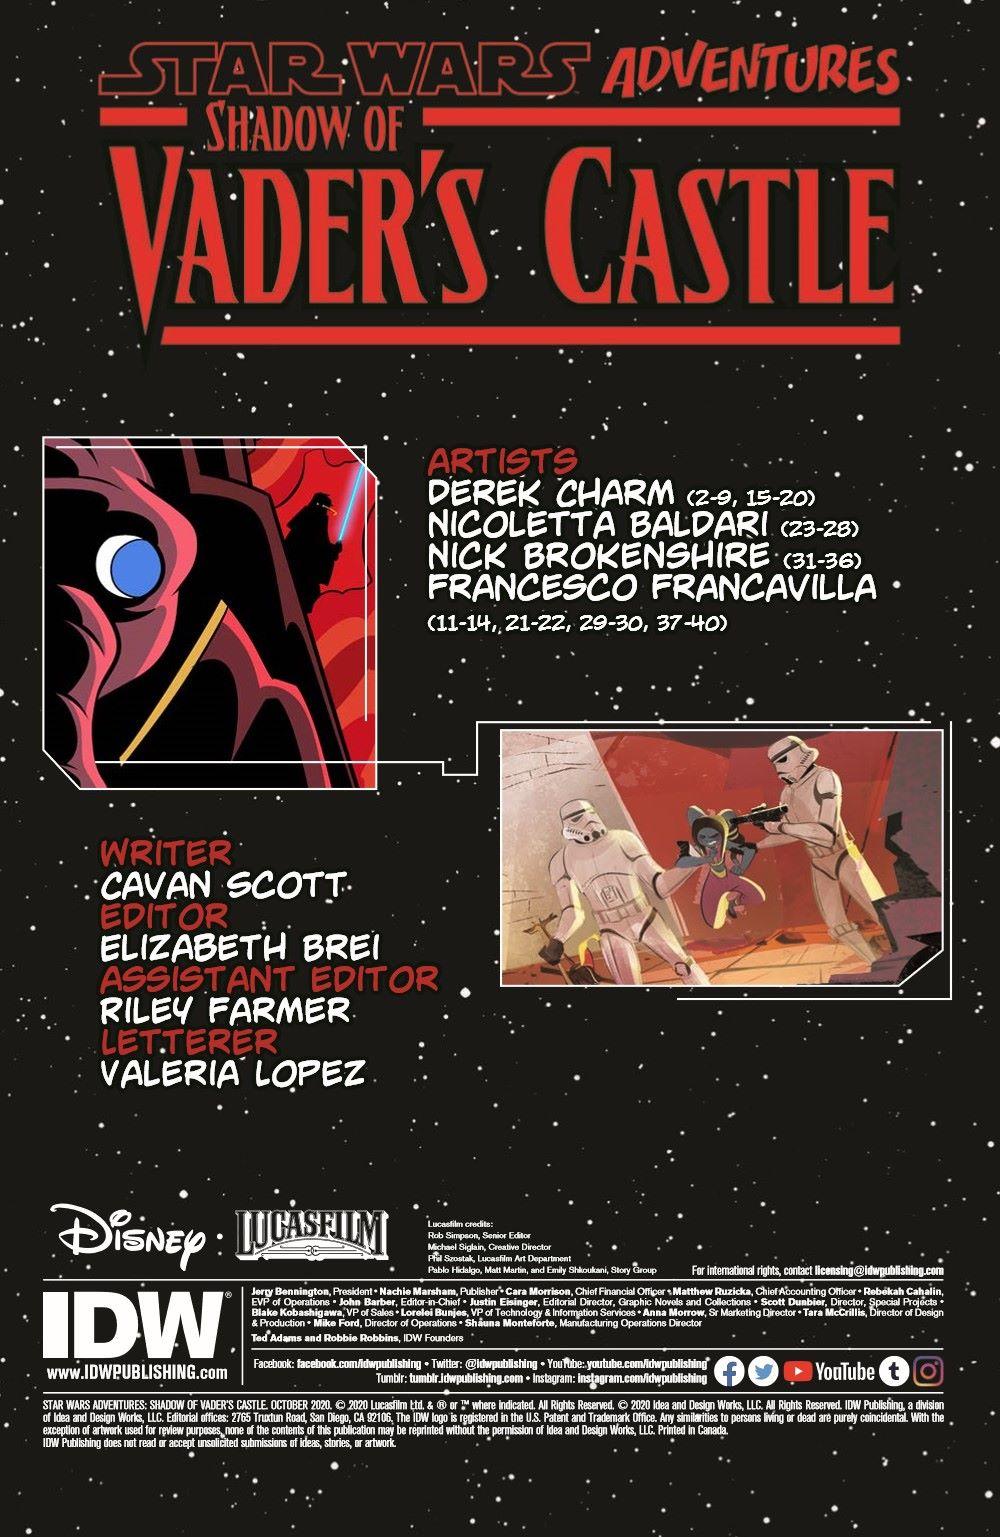 SW_ShadowOfVadersCastle_01-pr-2 ComicList Previews: STAR WARS ADVENTURES SHADOW OF VADER'S CASTLE #1